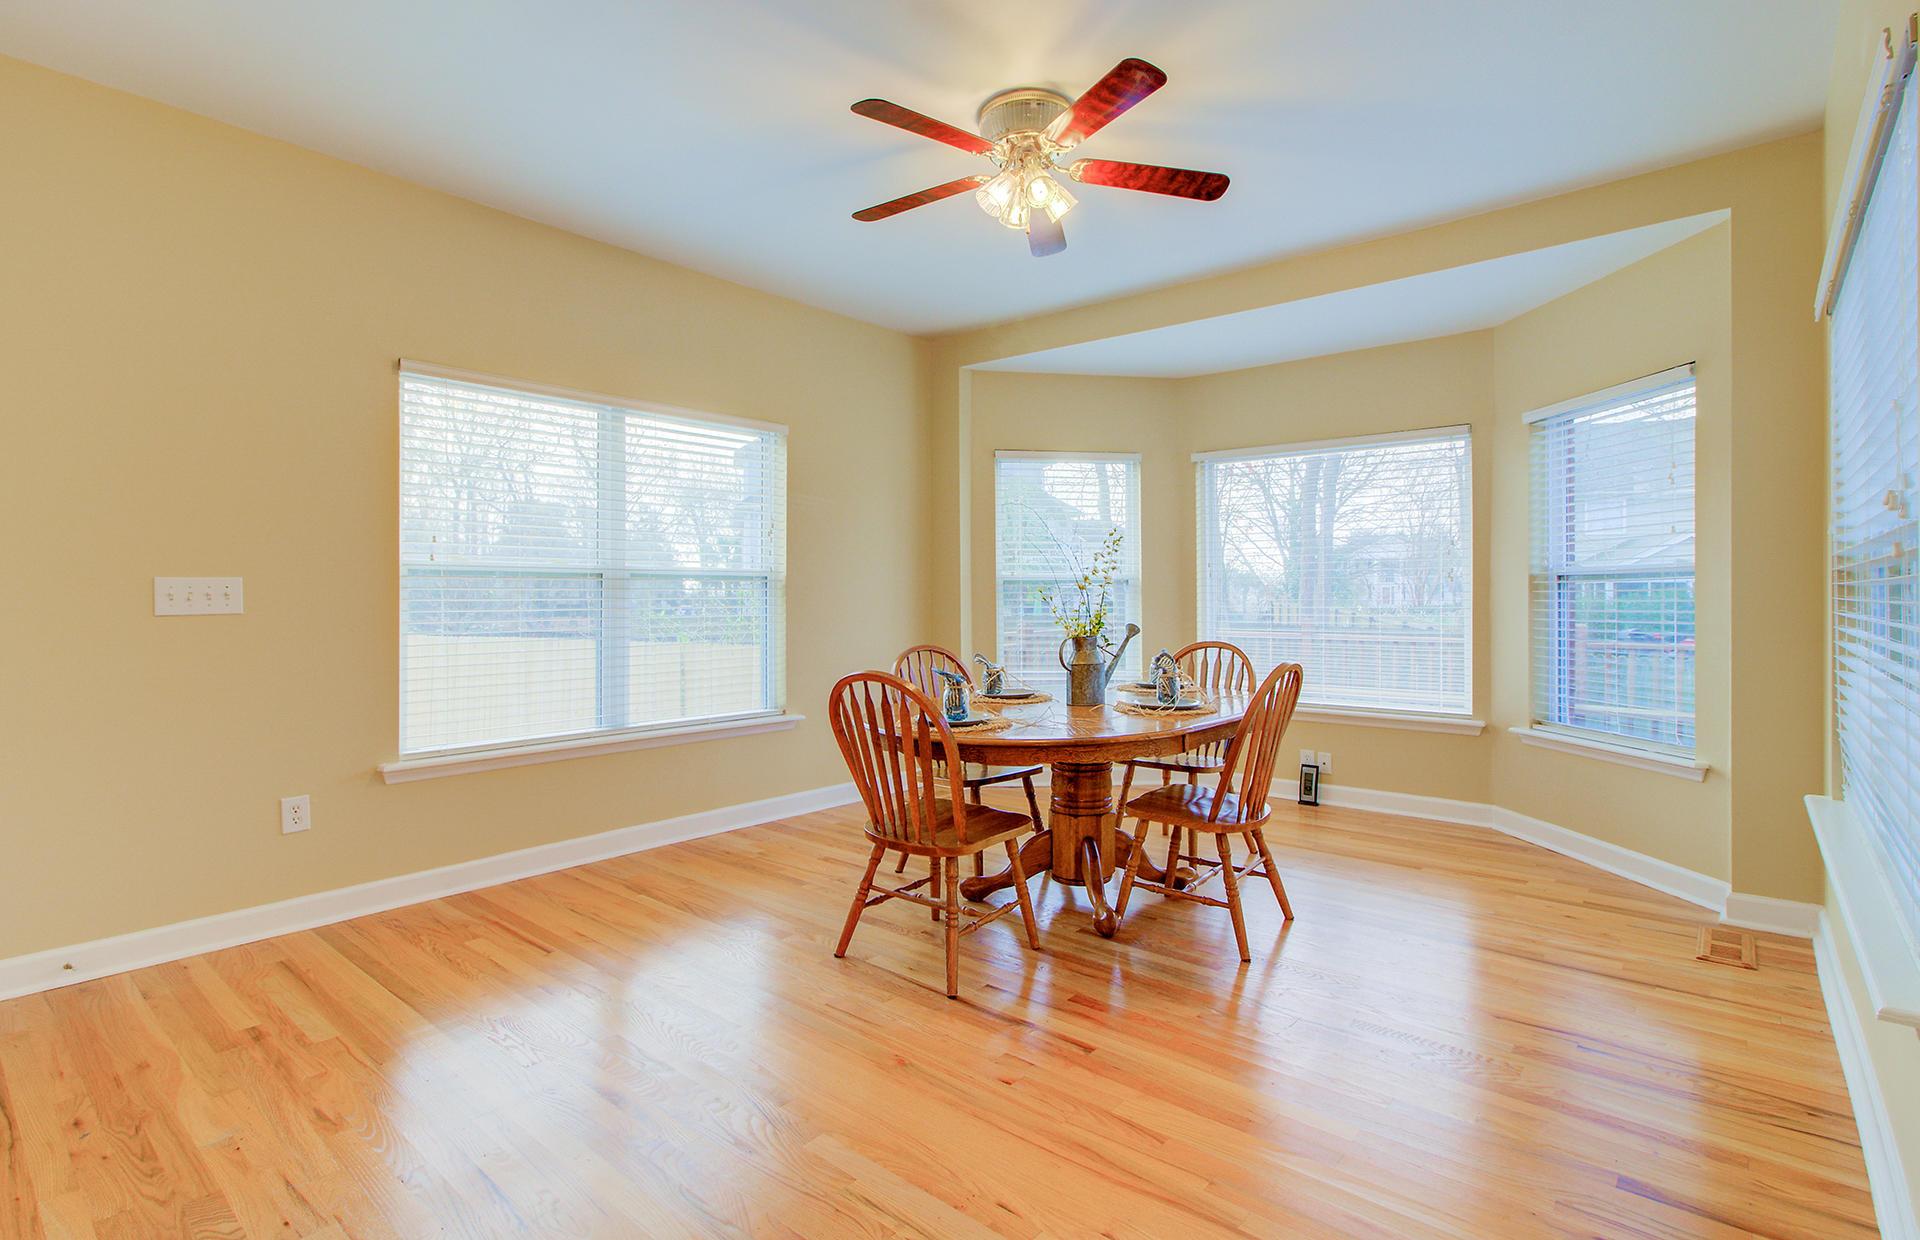 Bakers Landing Homes For Sale - 105 River Oak, North Charleston, SC - 20